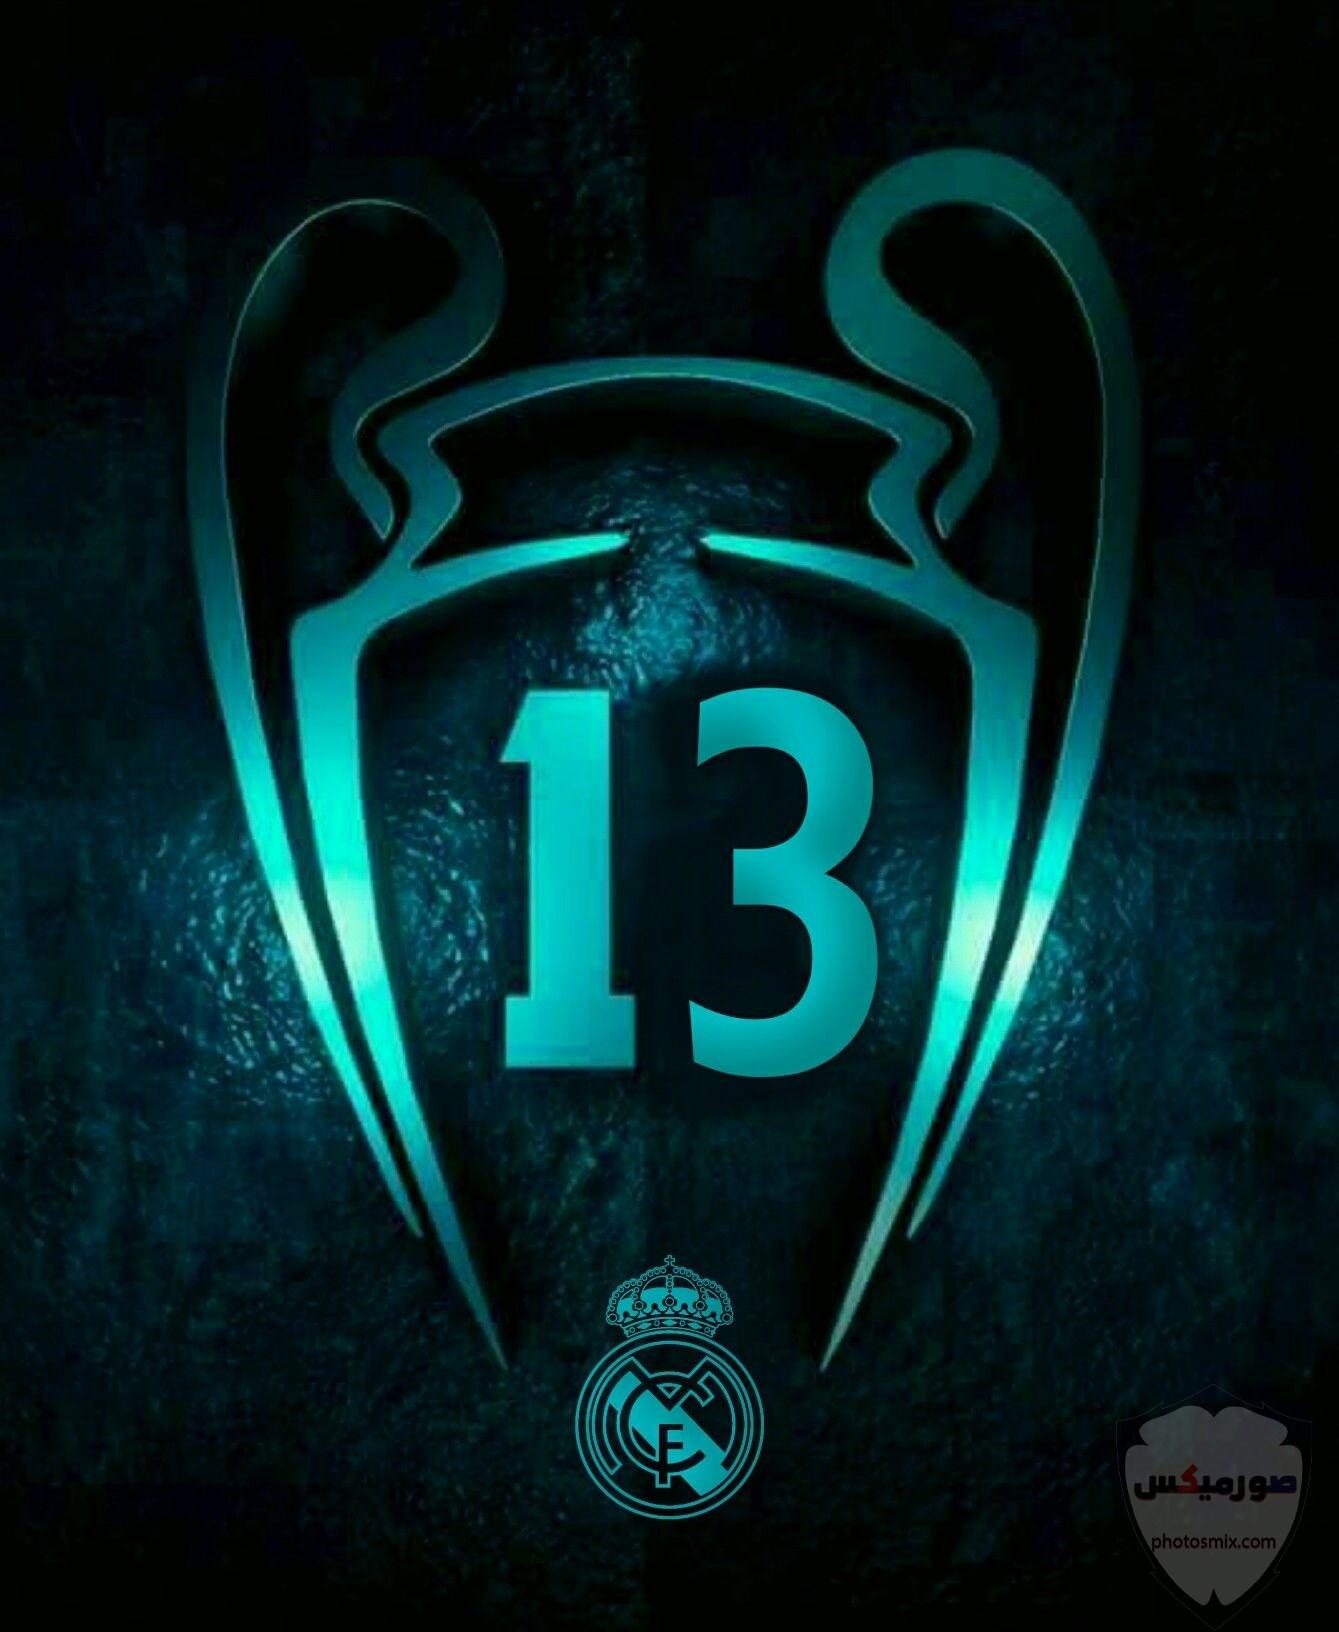 صور ريال مدريد 2020خلفيات ورمزيات ريال مدريد صور لاعبي ريال مدريد real madrid 5